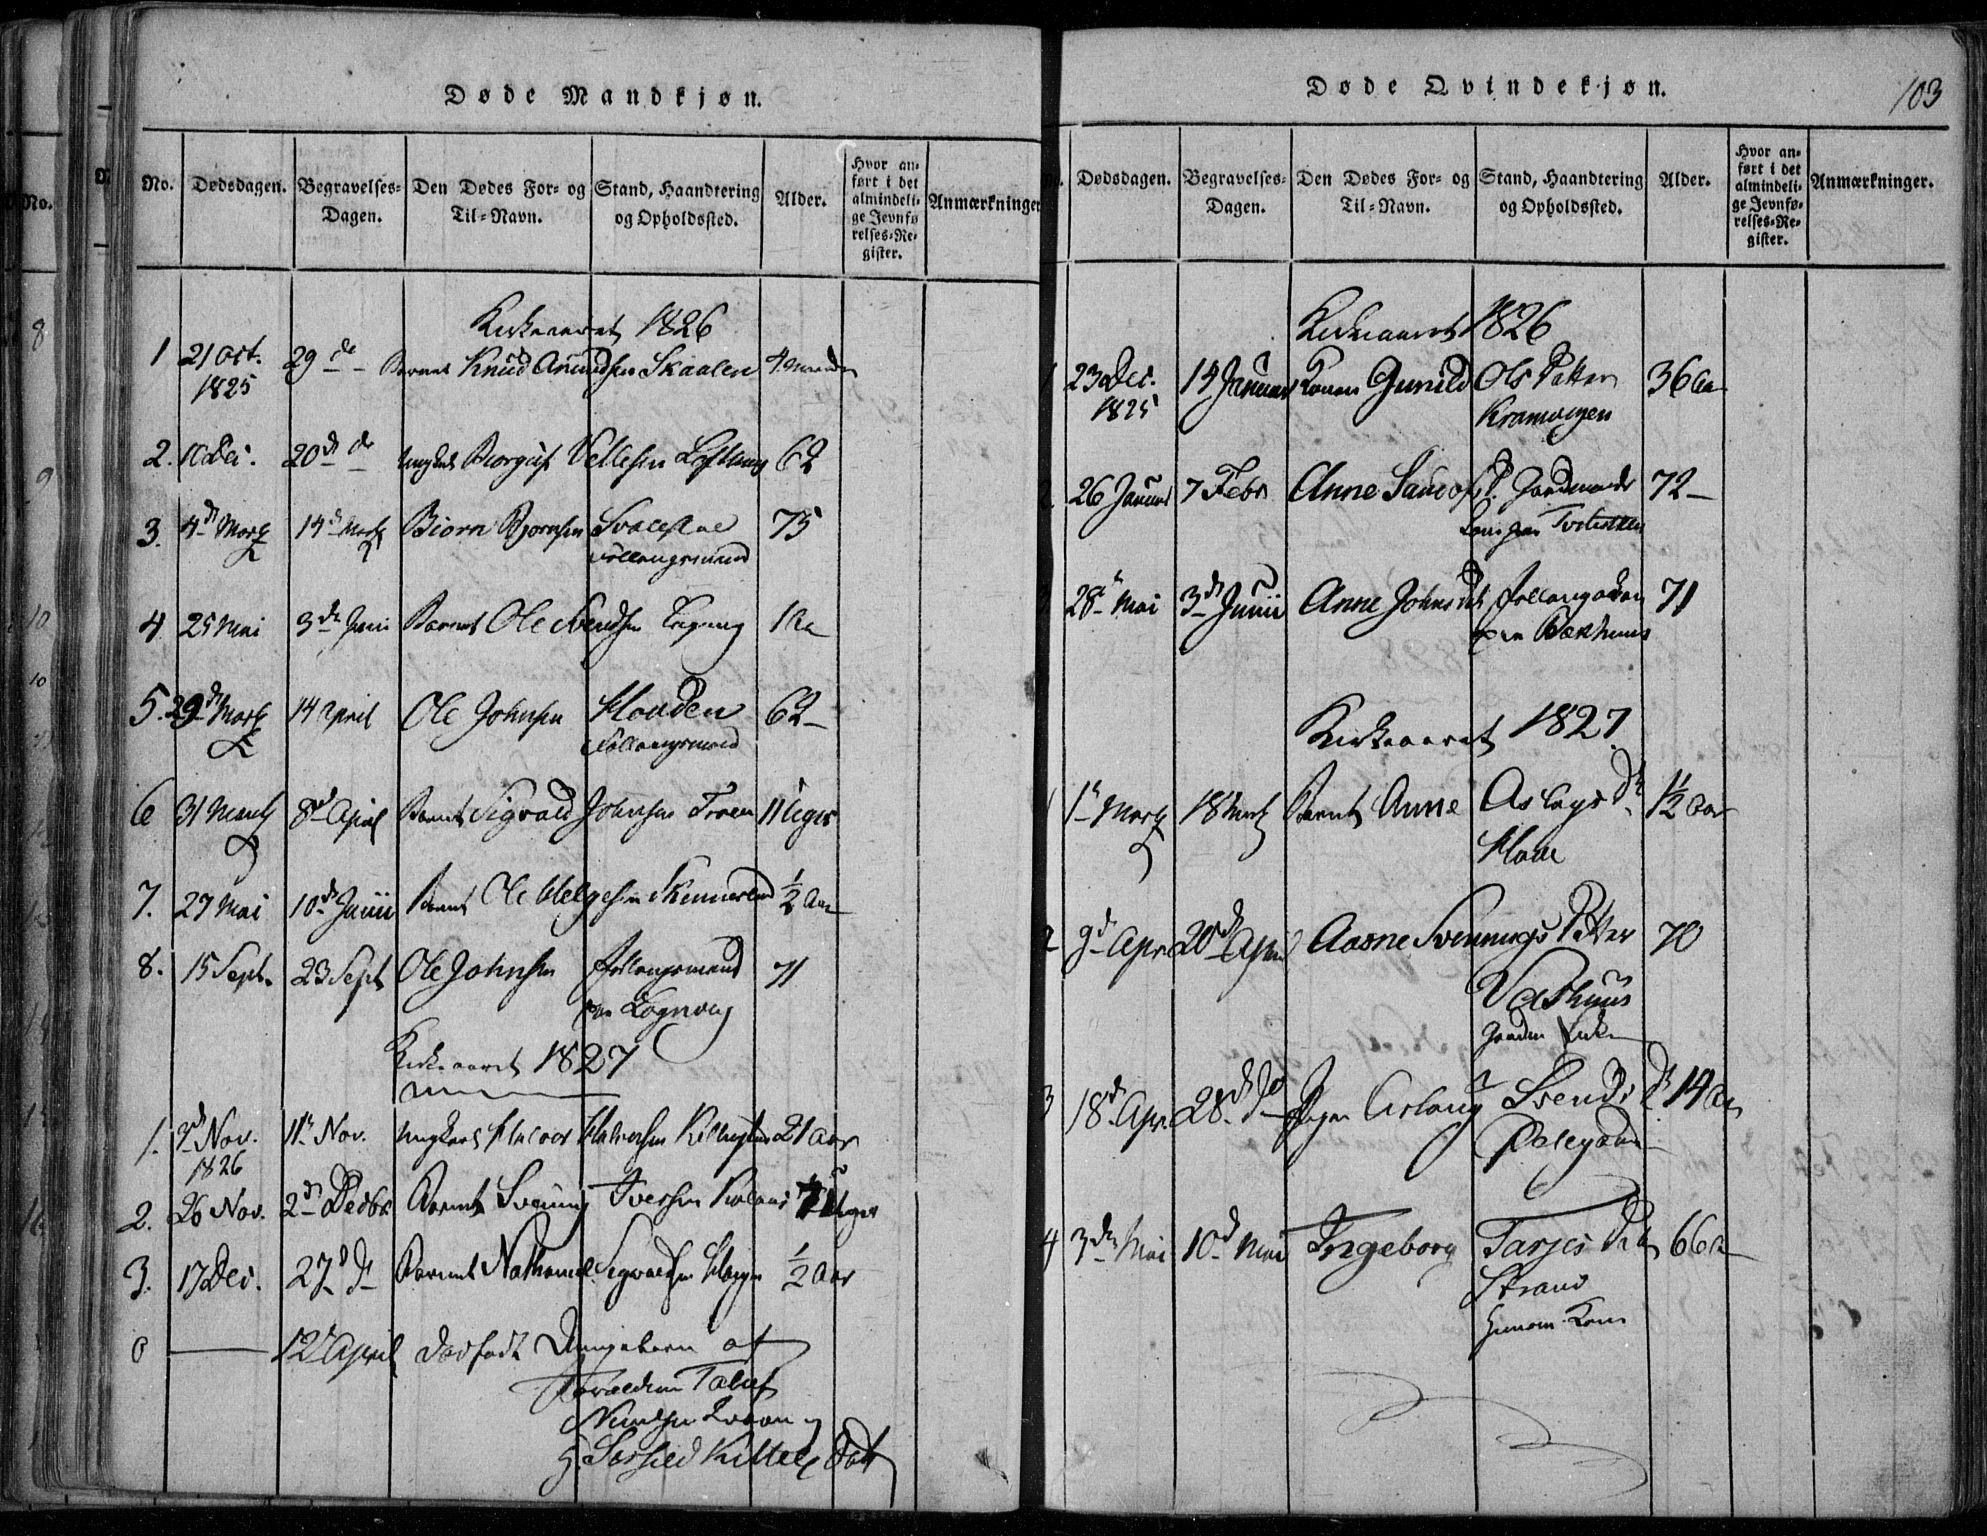 SAKO, Rauland kirkebøker, F/Fa/L0001: Ministerialbok nr. 1, 1814-1859, s. 103